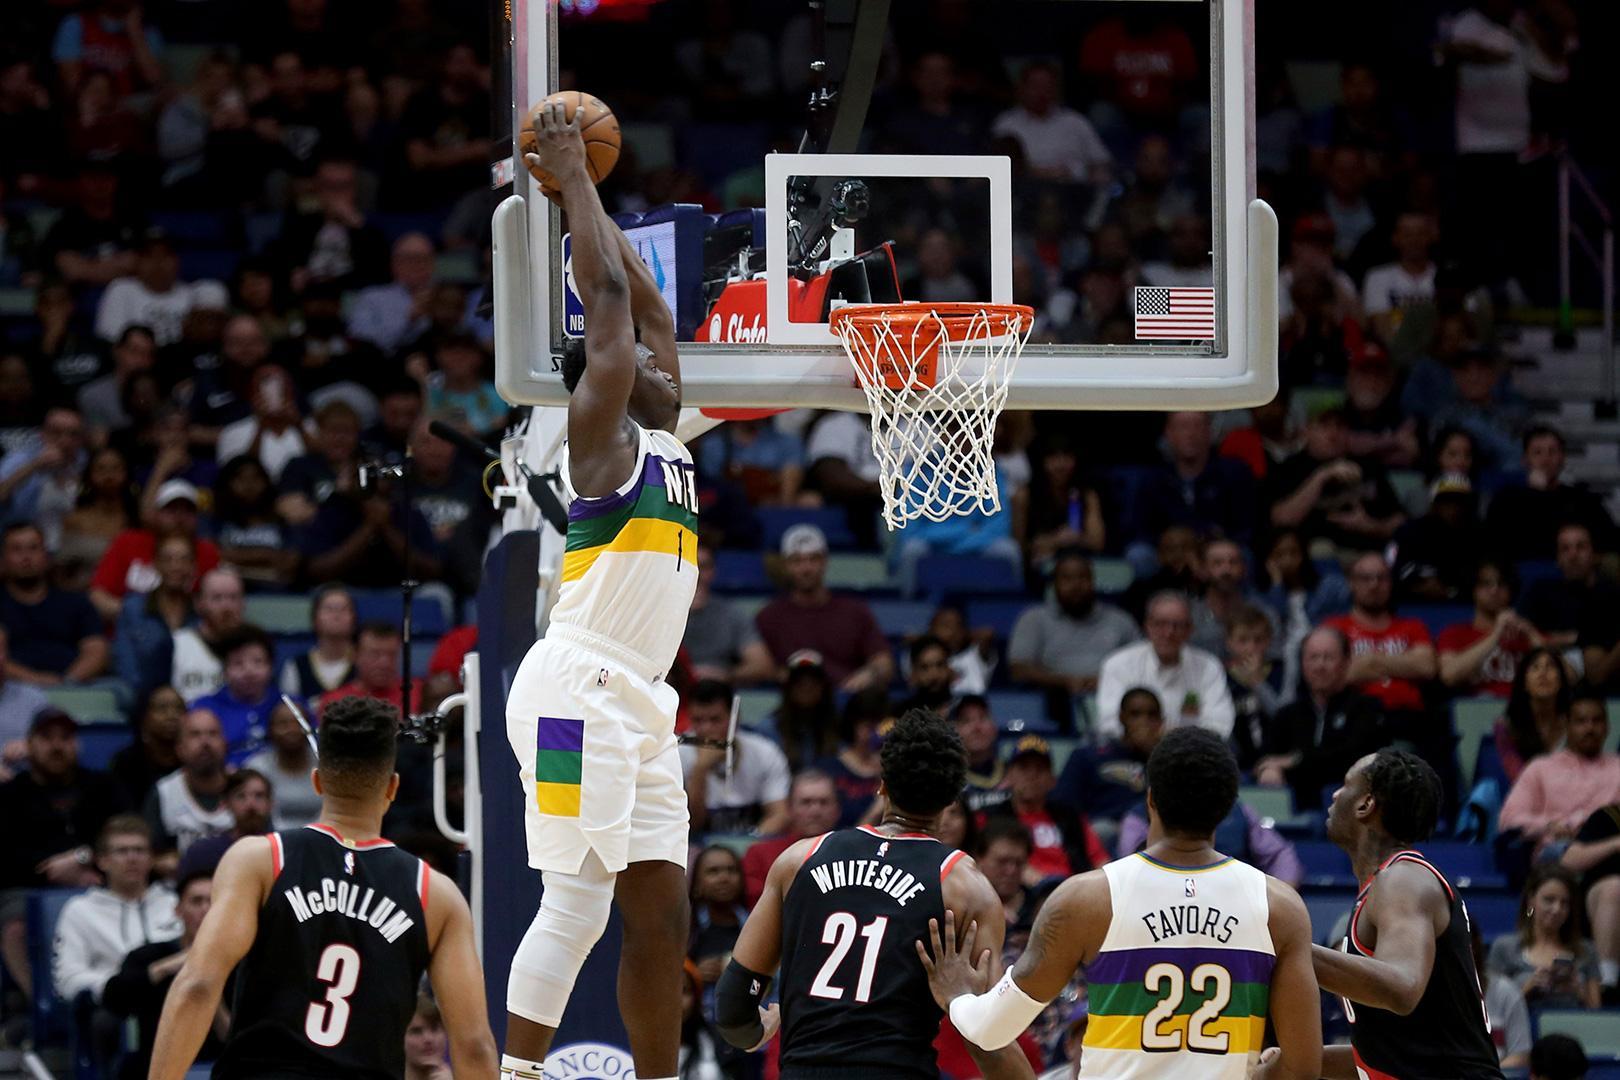 Зайон Уильямсон - суперзвезда НБА в 19 лет